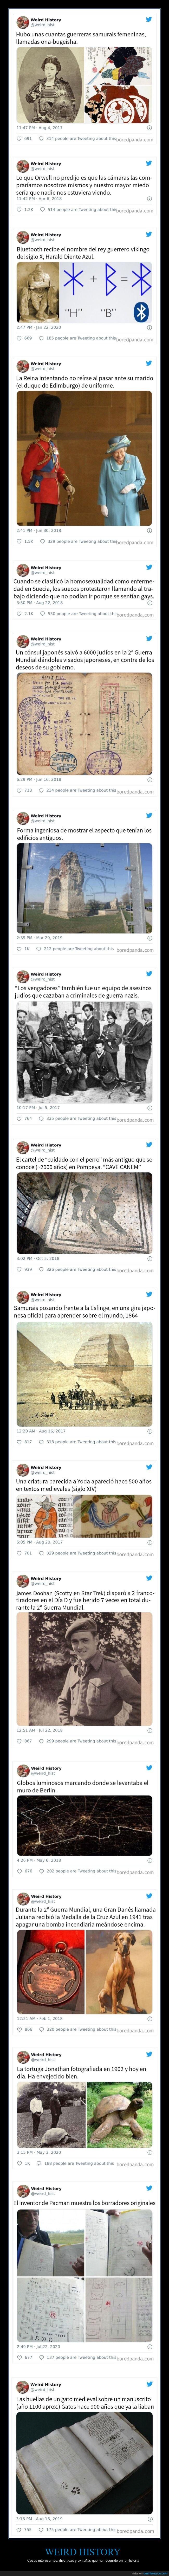 curiosidades,historia,weird history